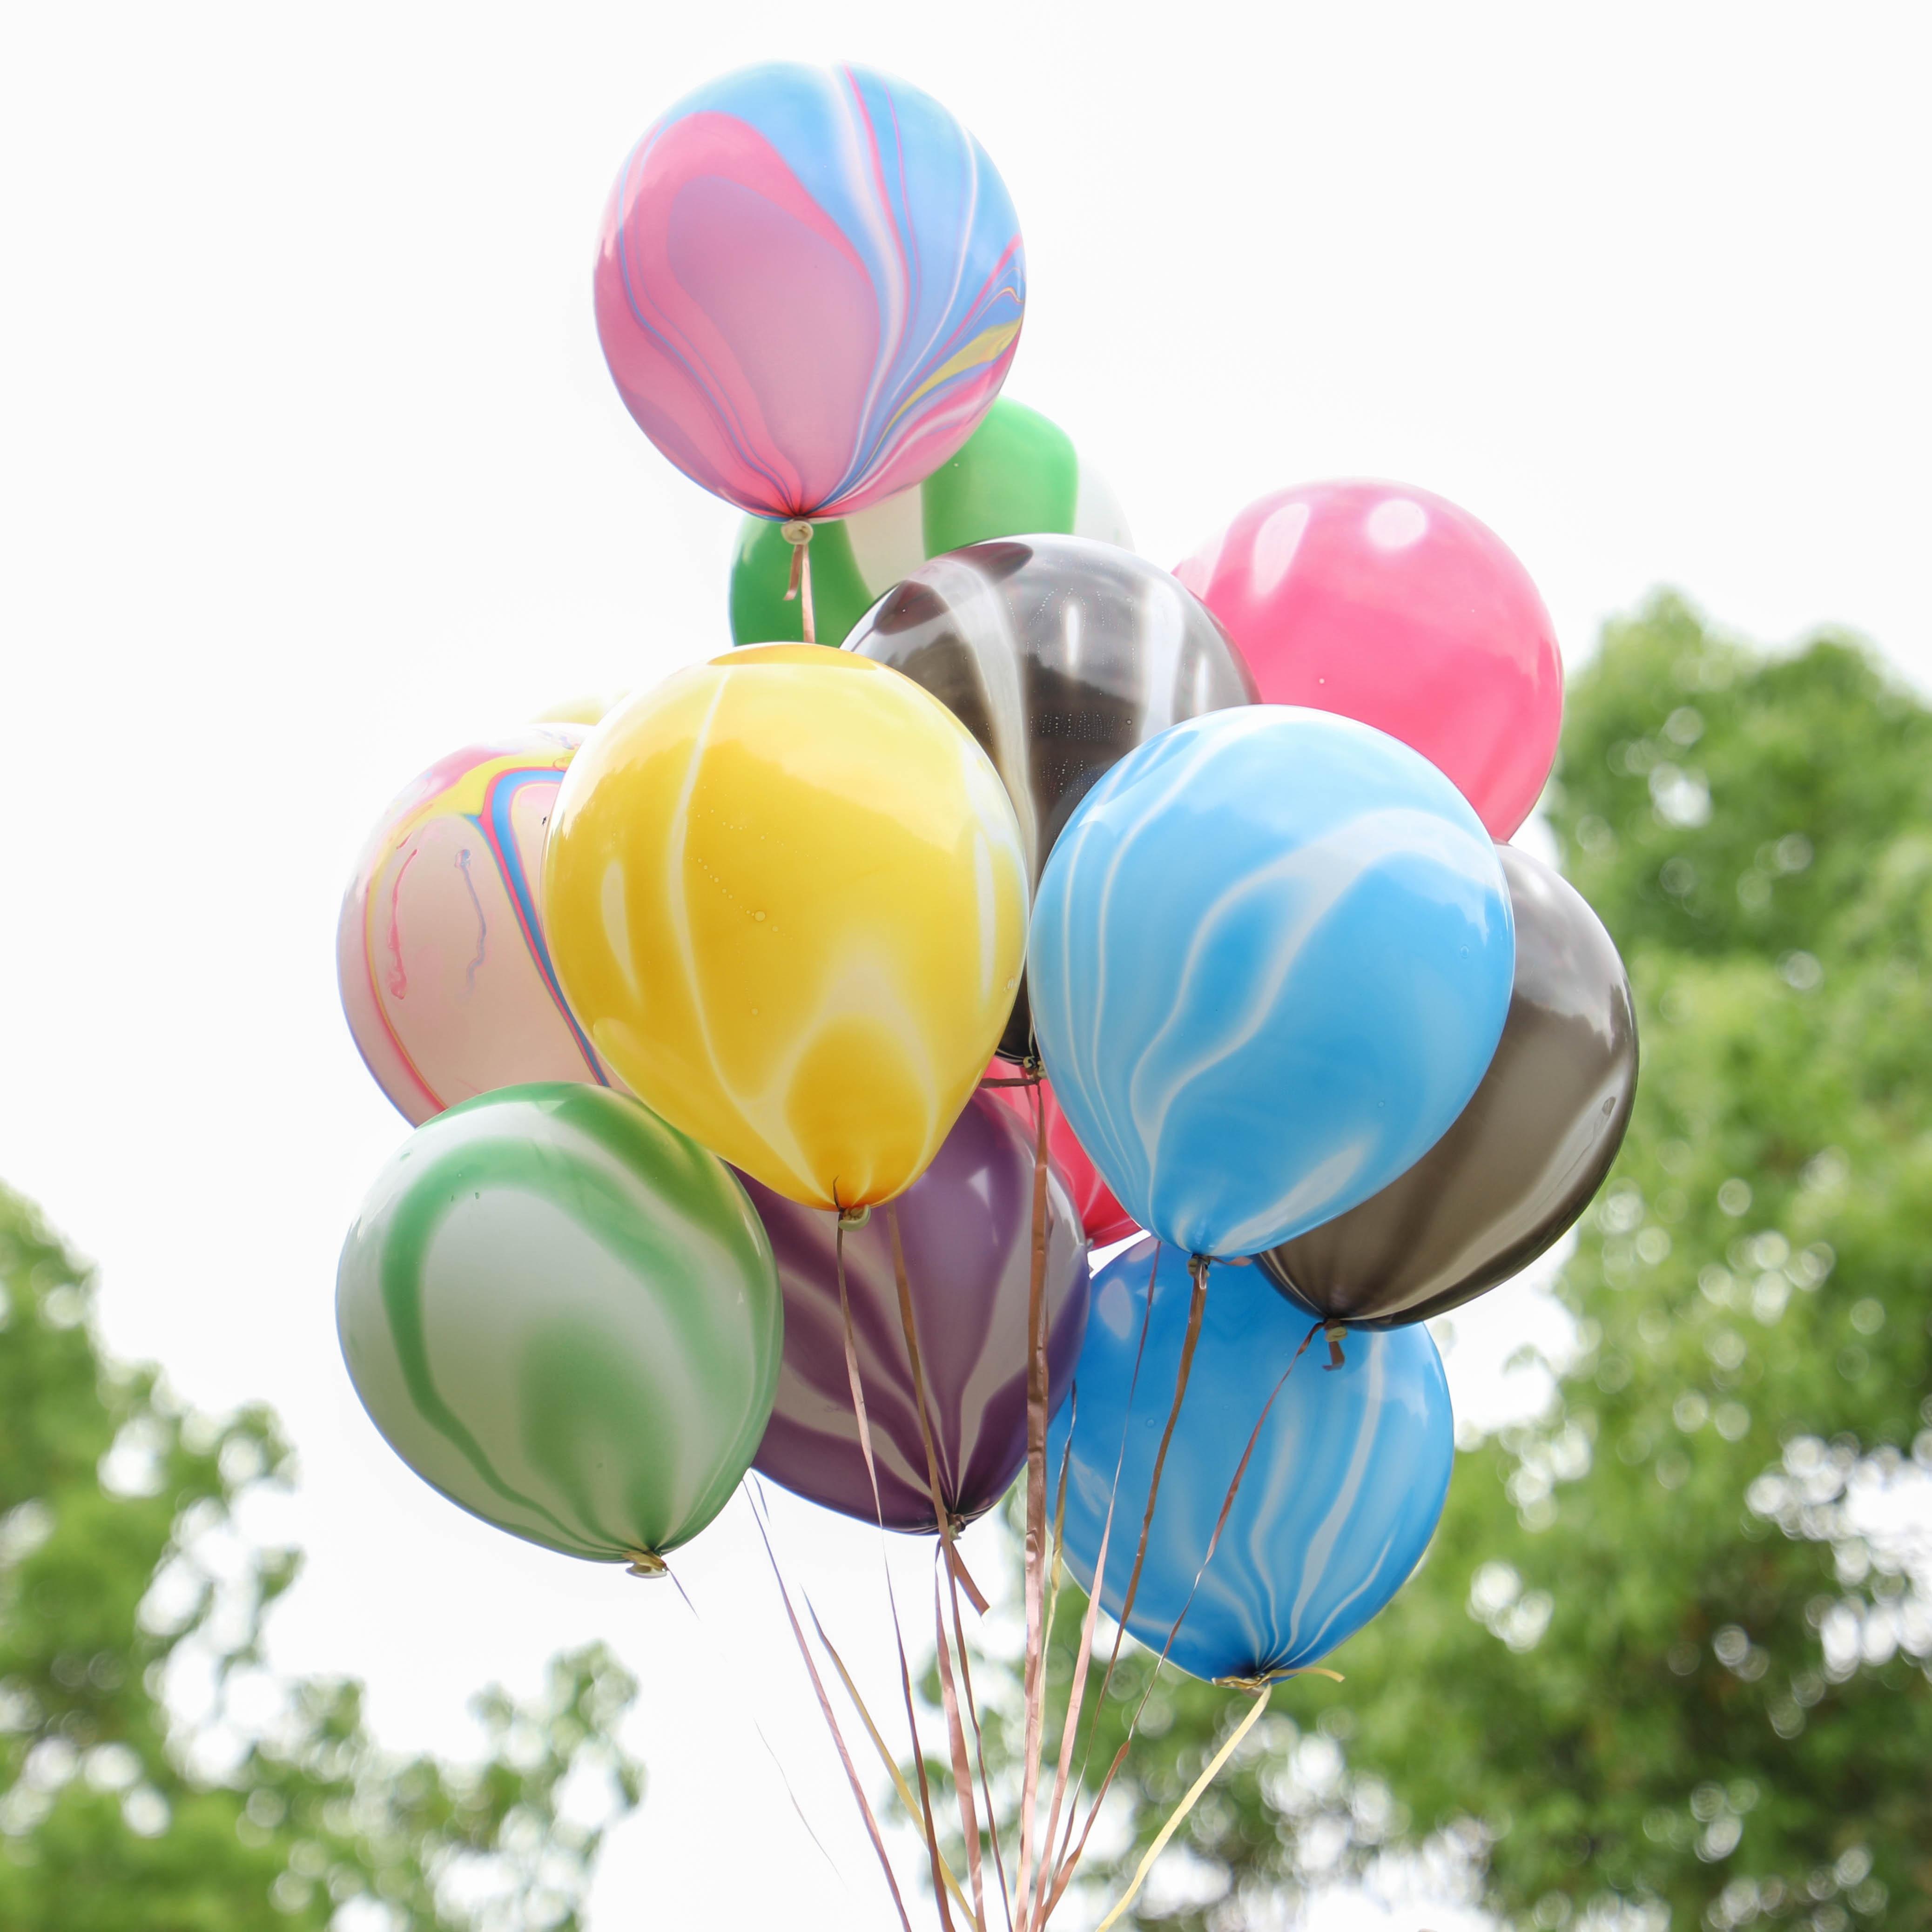 Pearlescent Latex helium Balloons Happy Birthday Party Decorations Wedding anniversaire mariage ballons decoration birthda